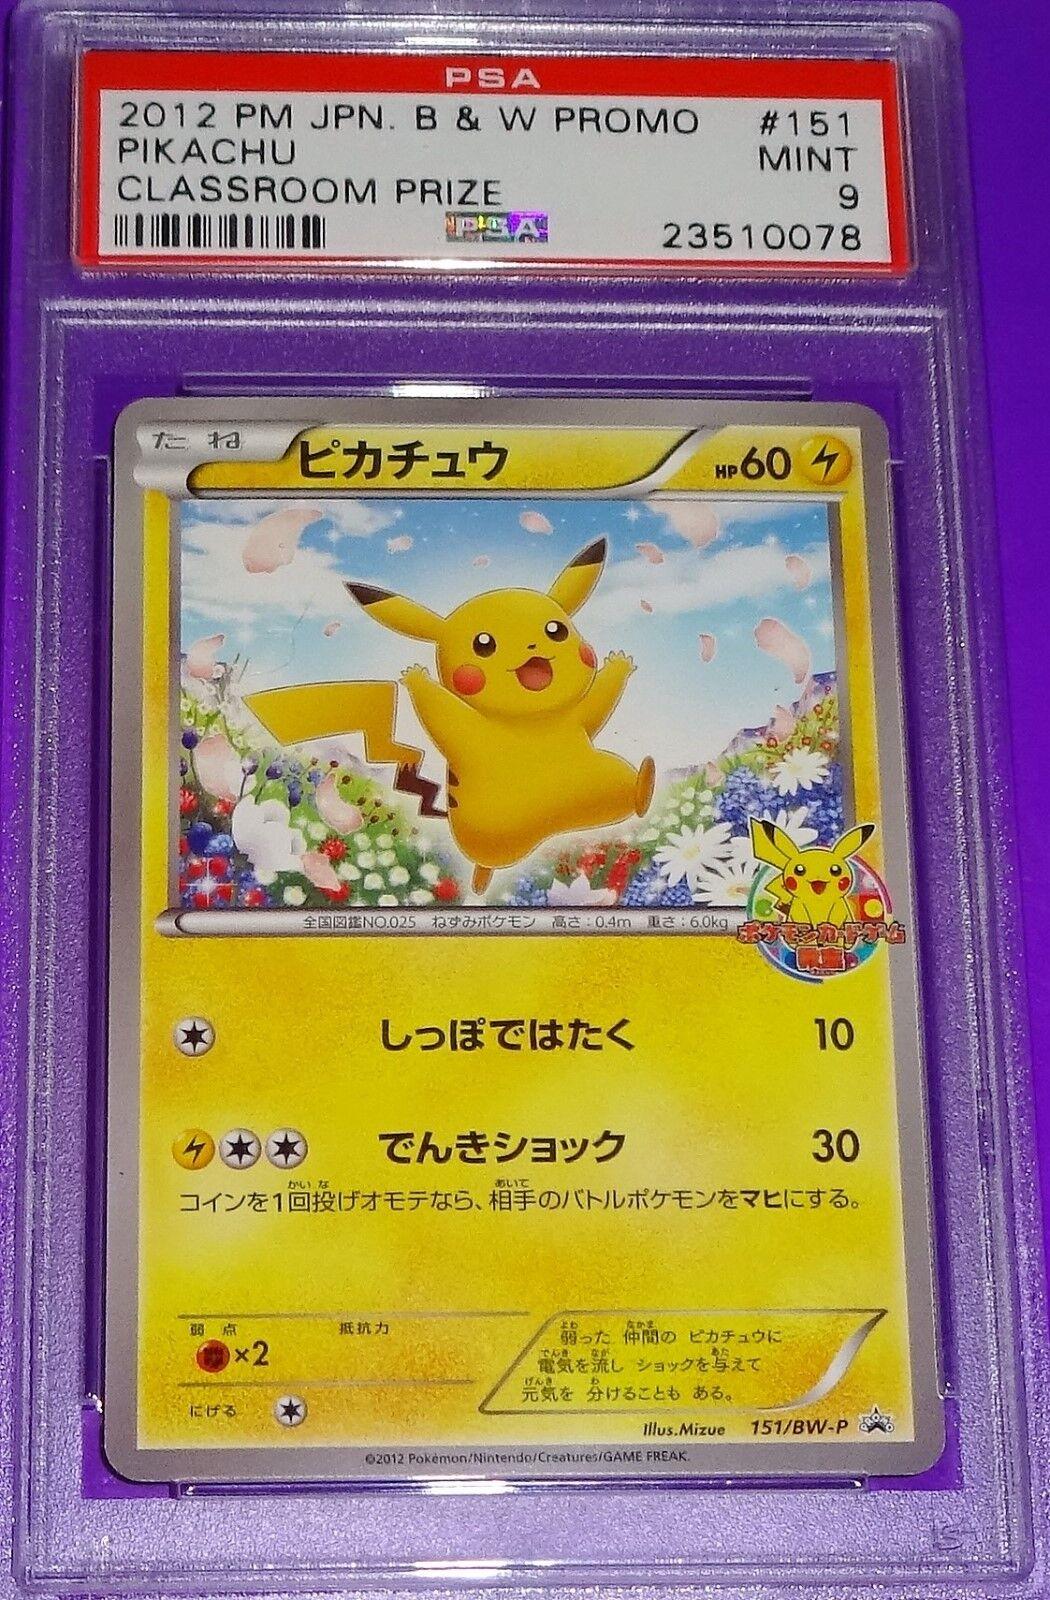 Pokemon Pikachu Japanese Classroom Prize B&W Promo Psa 9